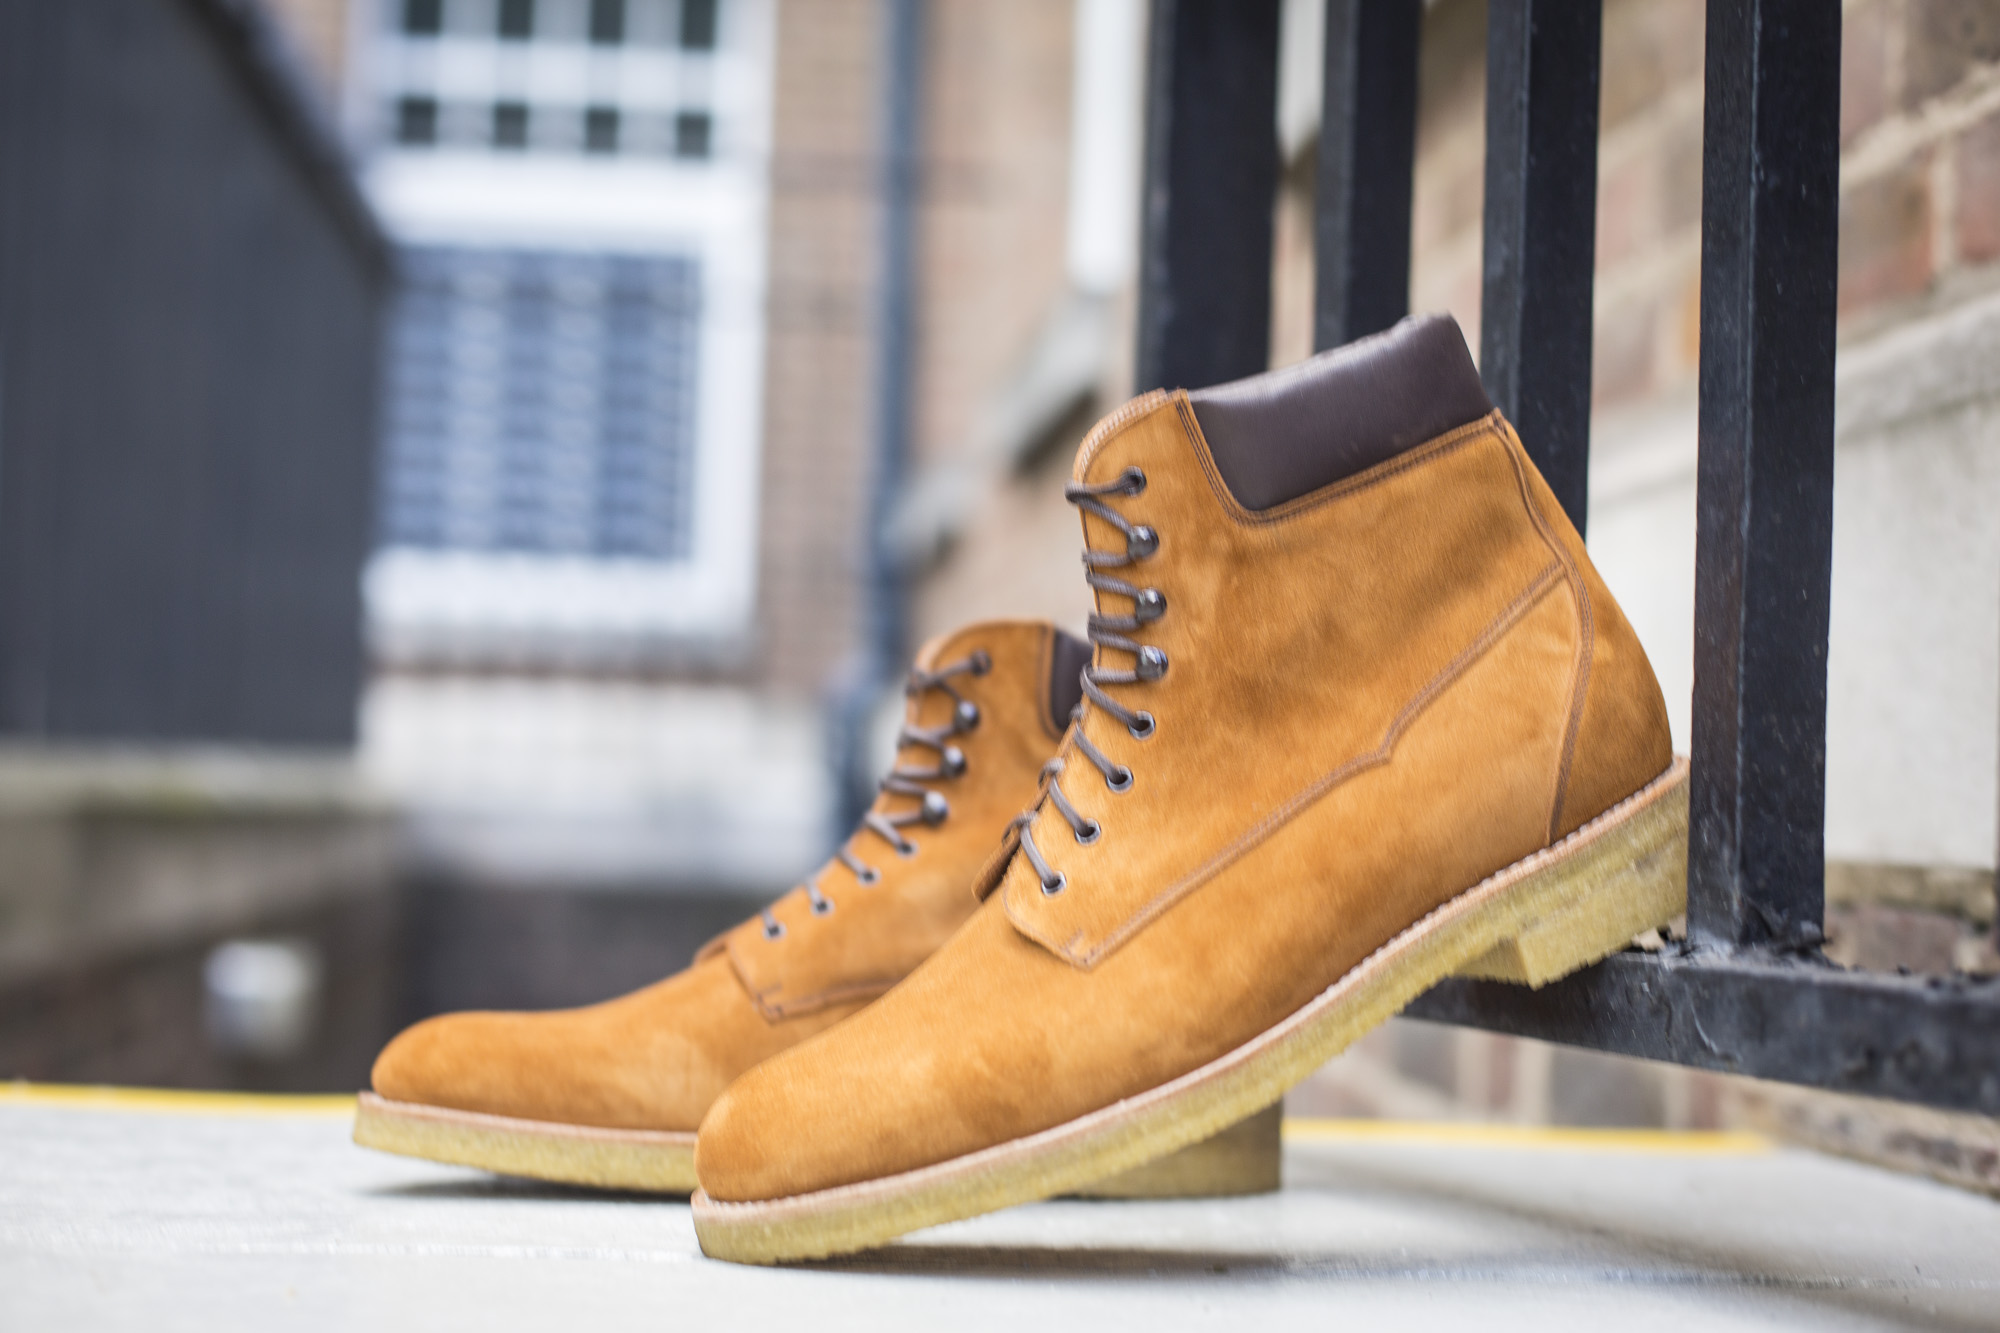 j-fitzpatrick-footwear-collection-28-september-2018-hero-00285.jpg